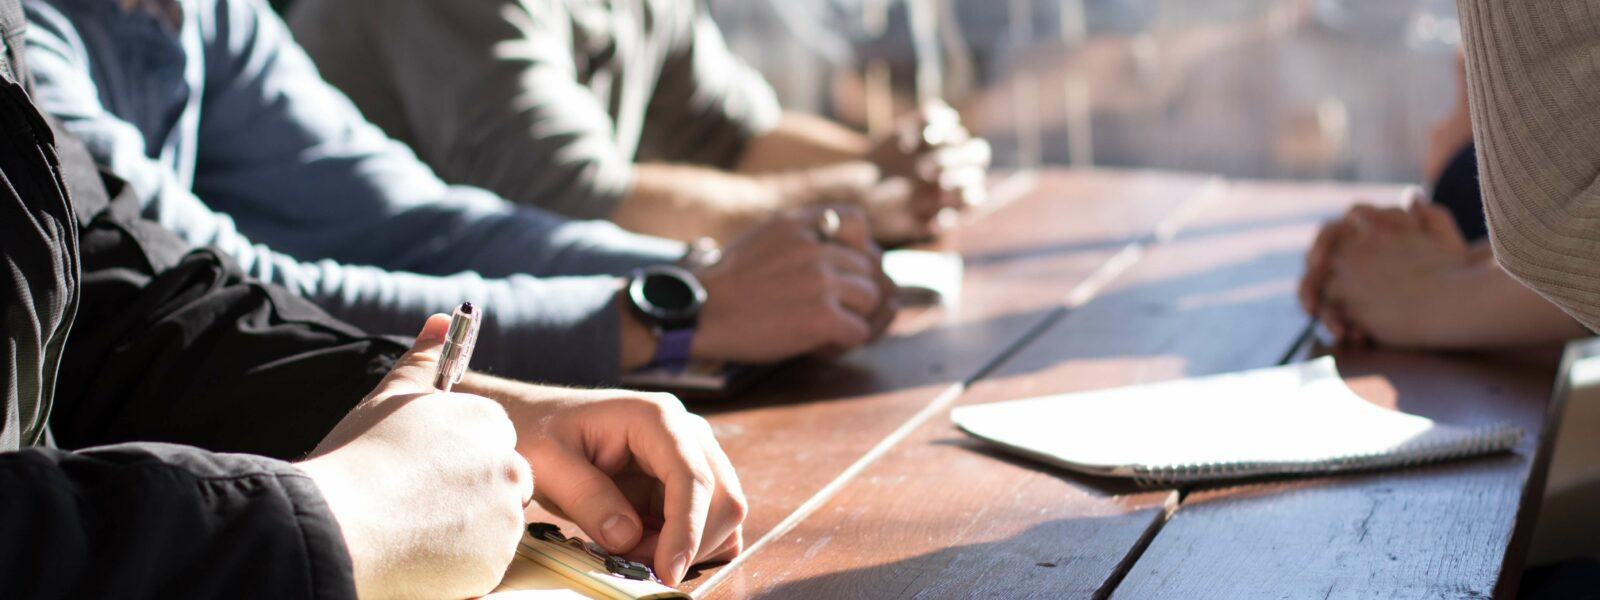 NNRC Announces Database of Partners